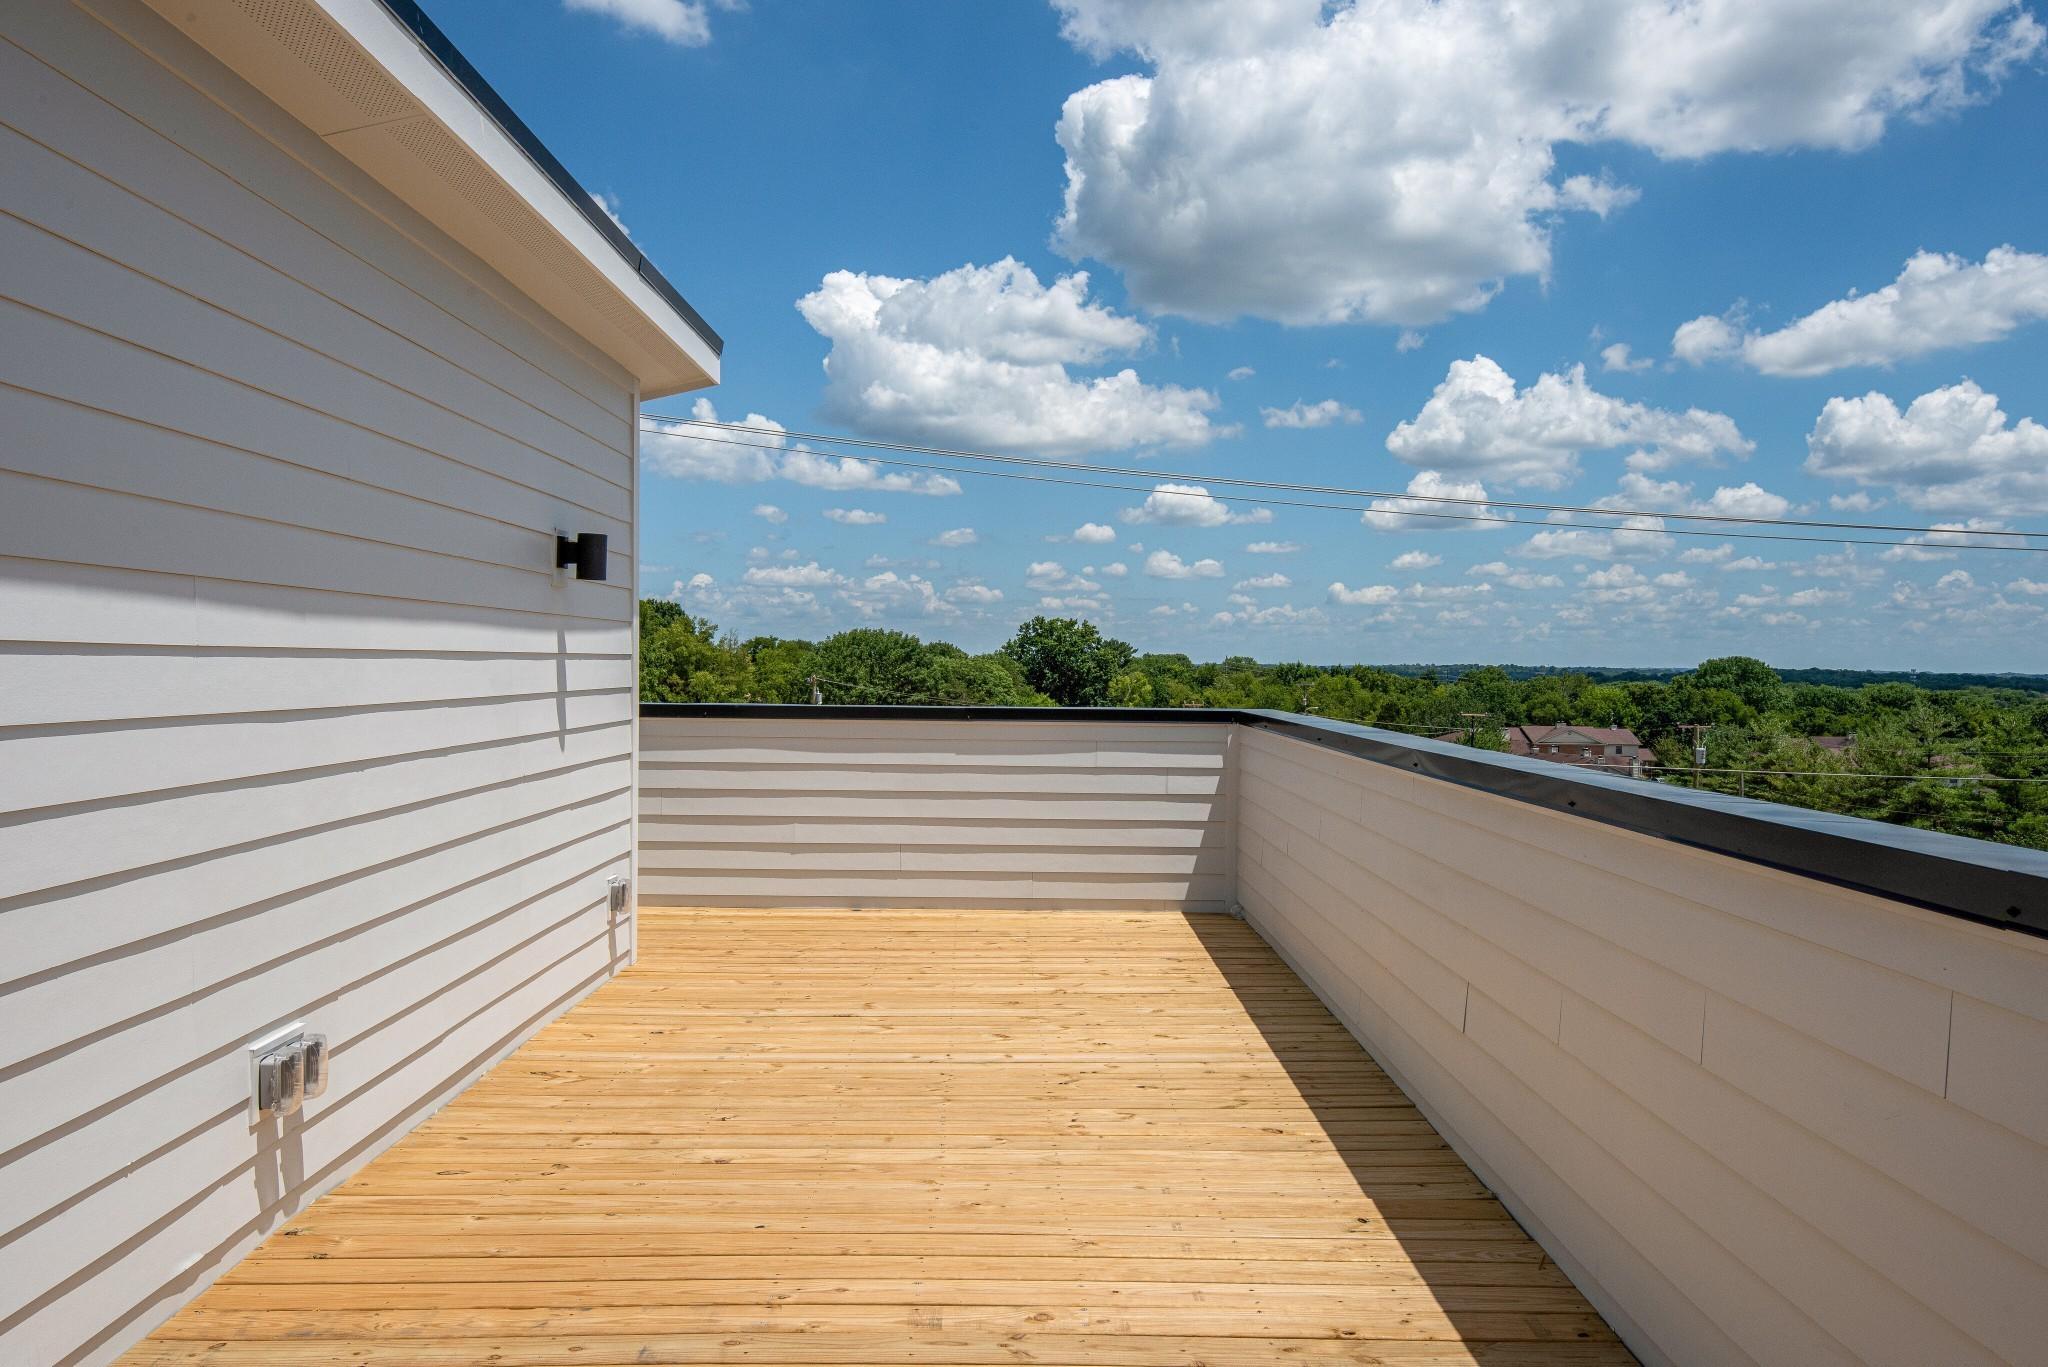 500 Creative Way #21 Property Photo - Madison, TN real estate listing